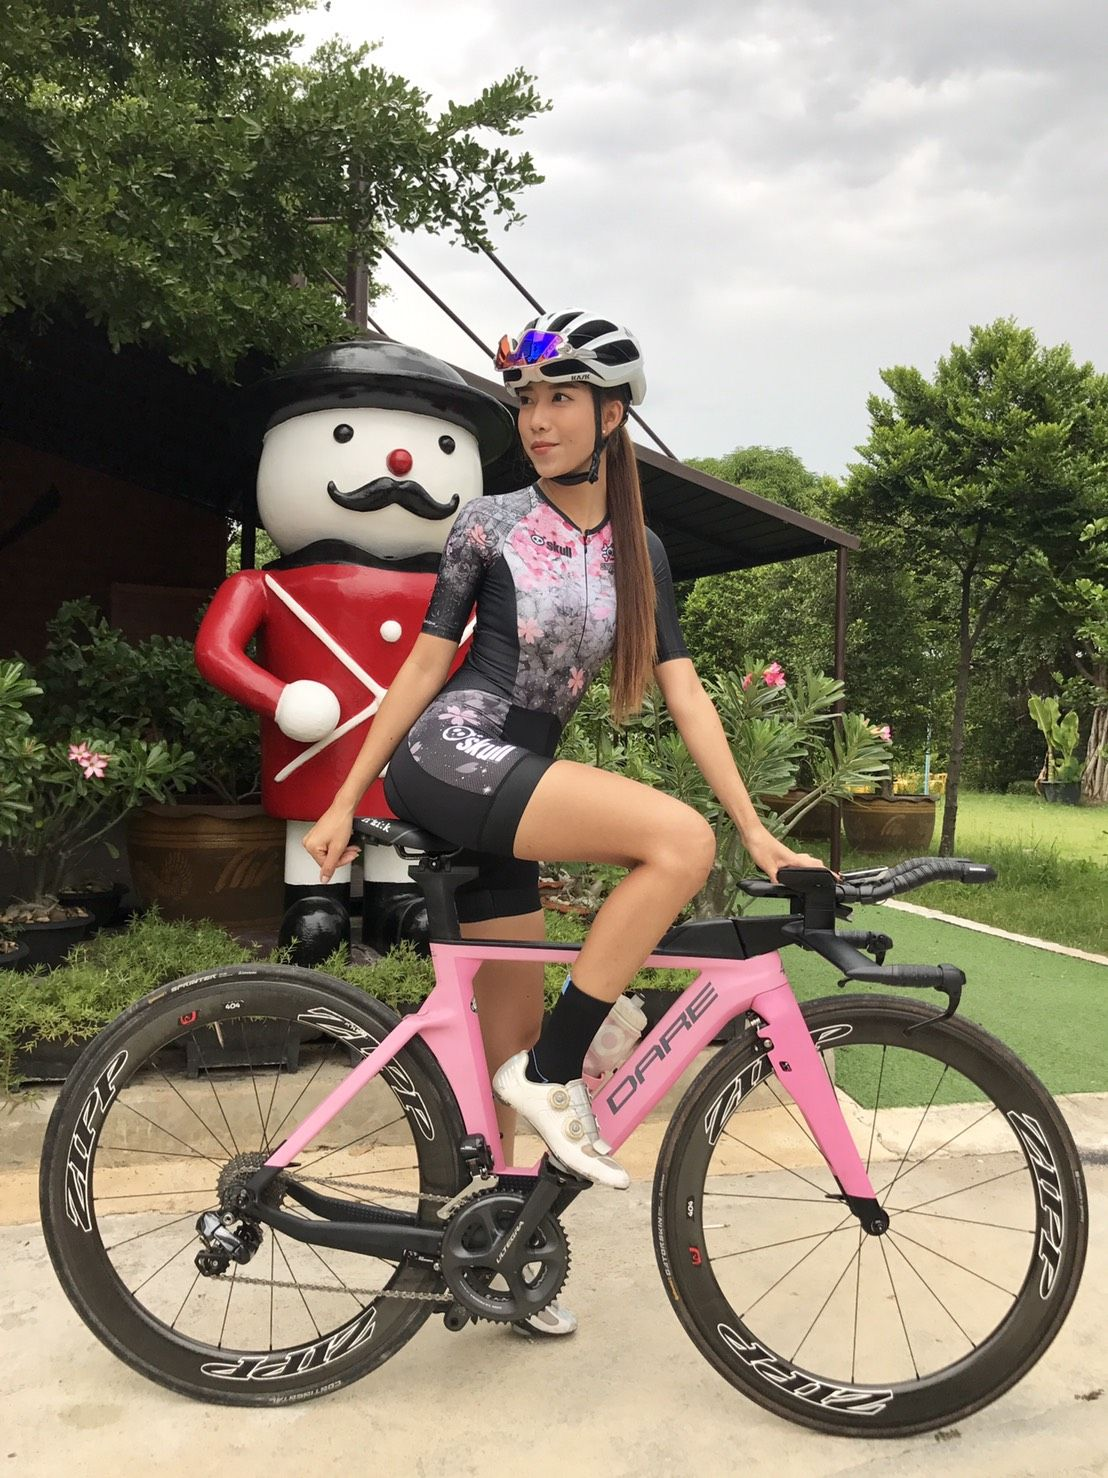 Skully Aero Suit By Skull Model Naming Thailand Cycling Girl